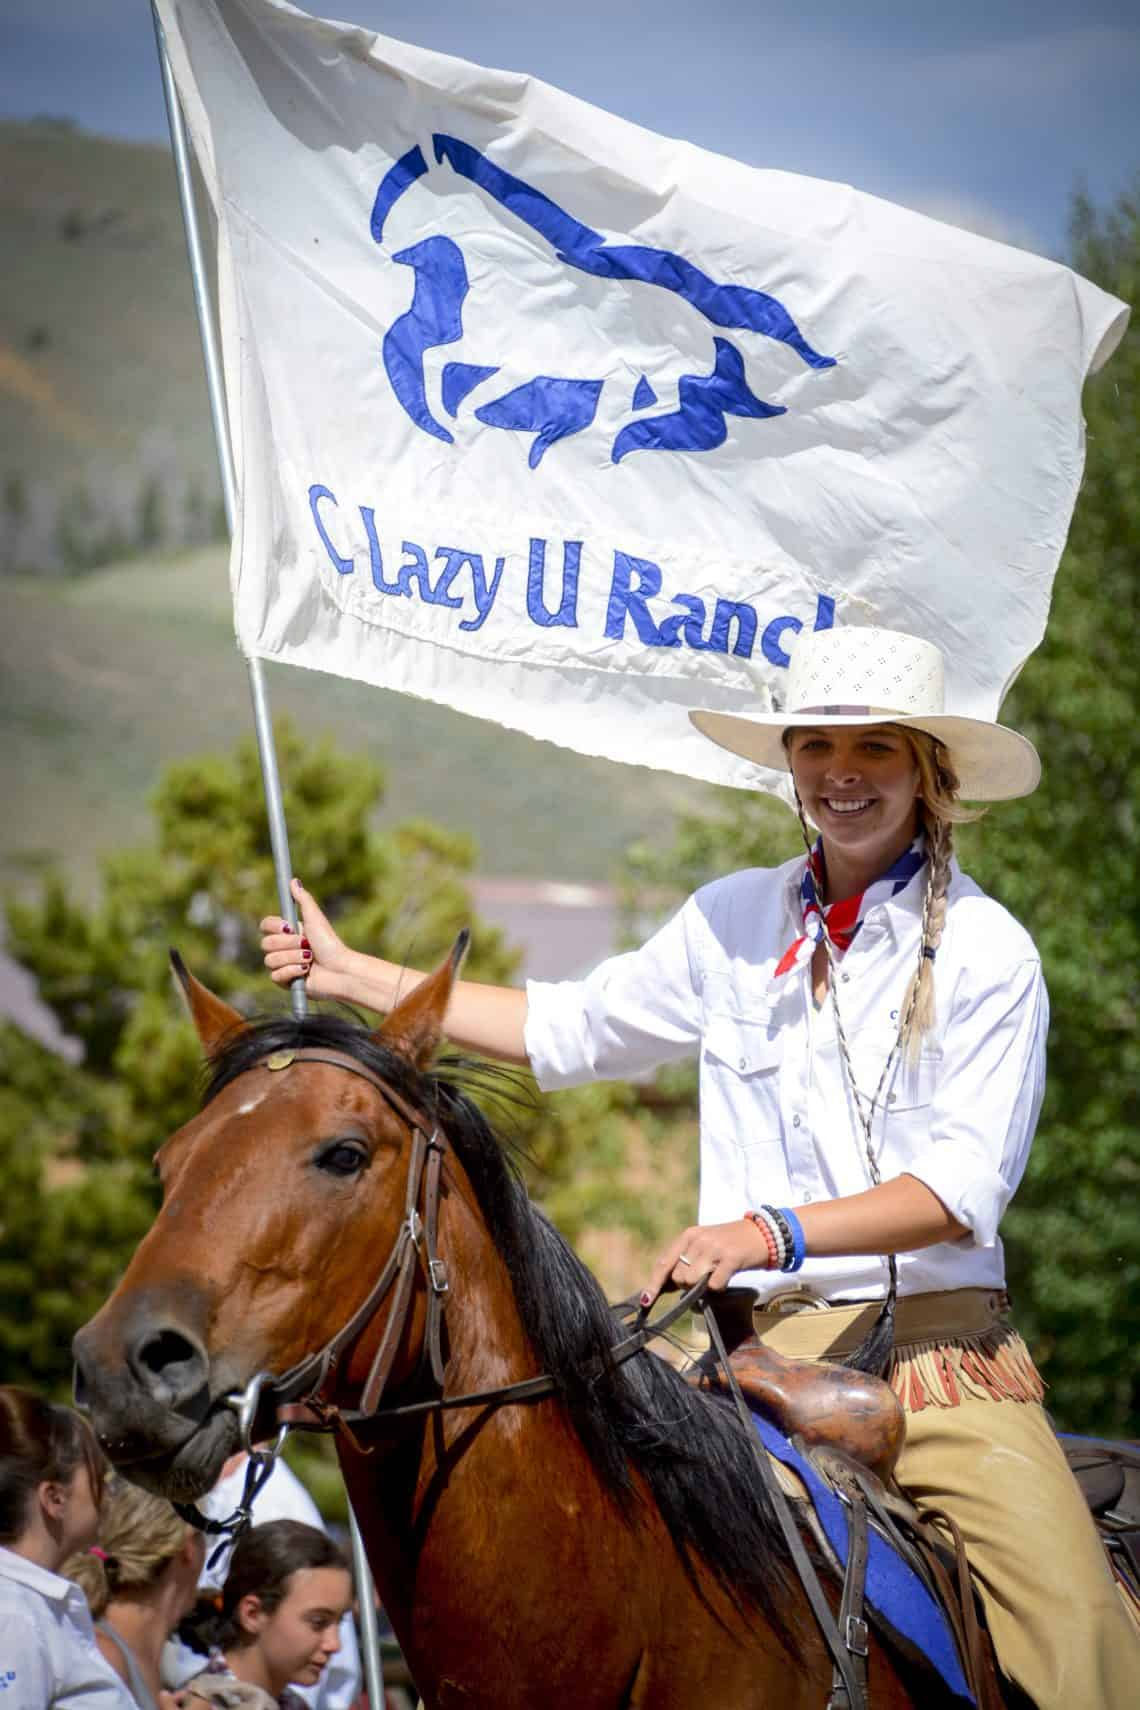 c lazy u ranch girl holding flag on horse